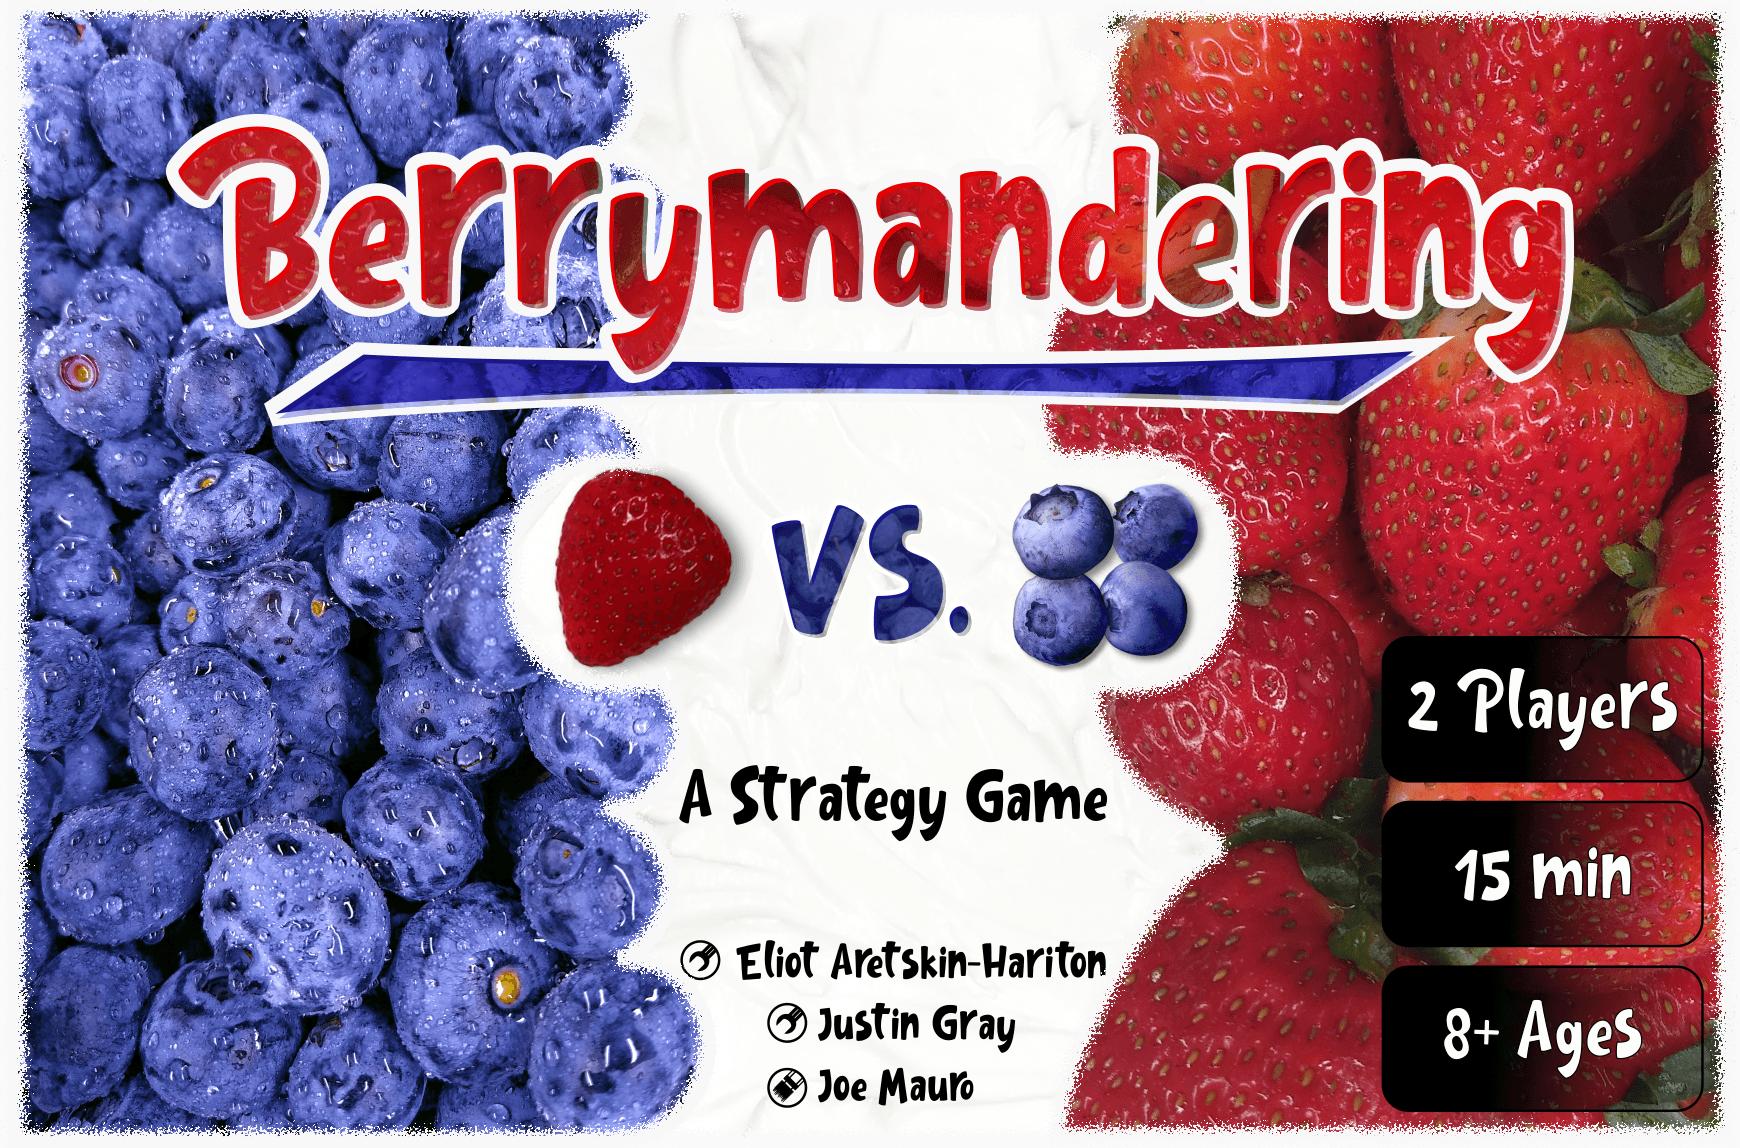 Berrymandering